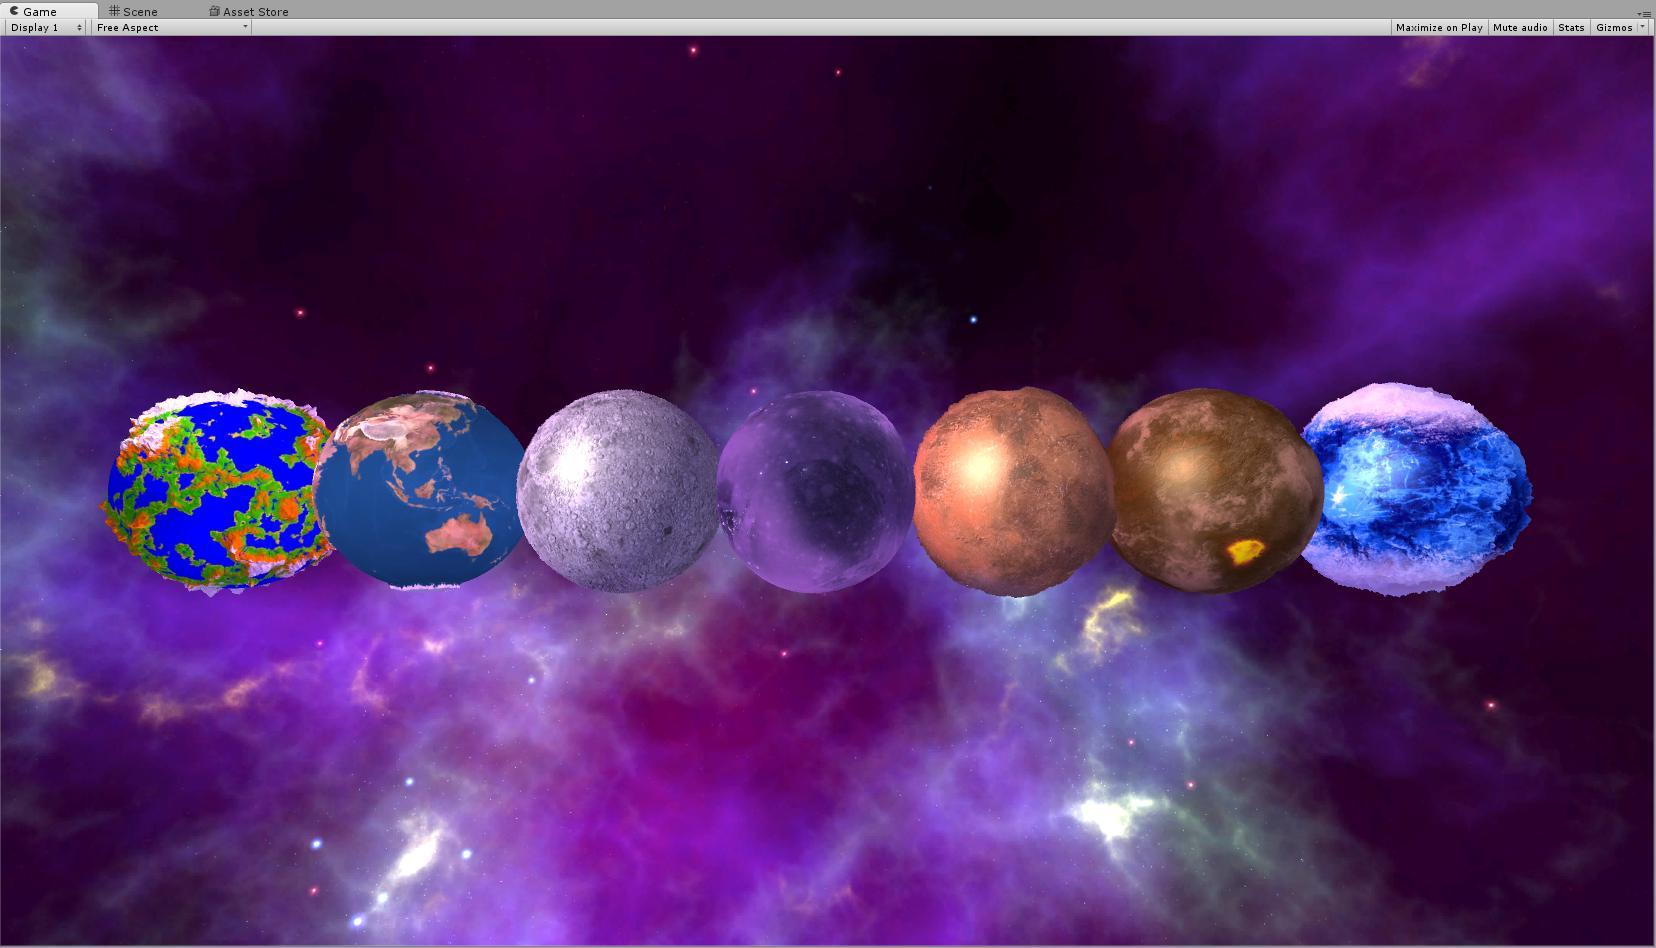 Unity 2016-01-13 05-35-23-40.jpg